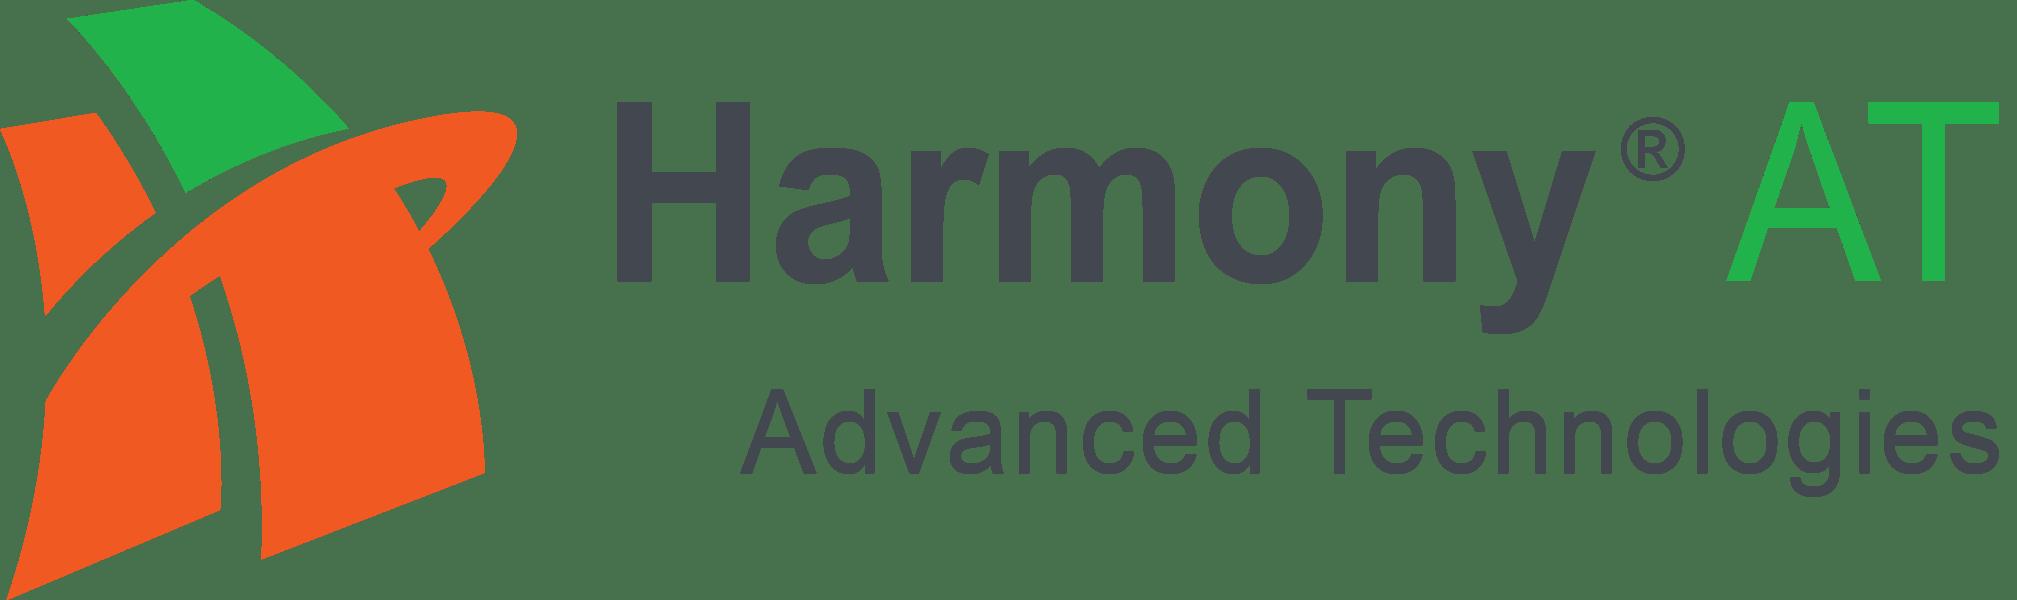 Harmony Advanced Technologies